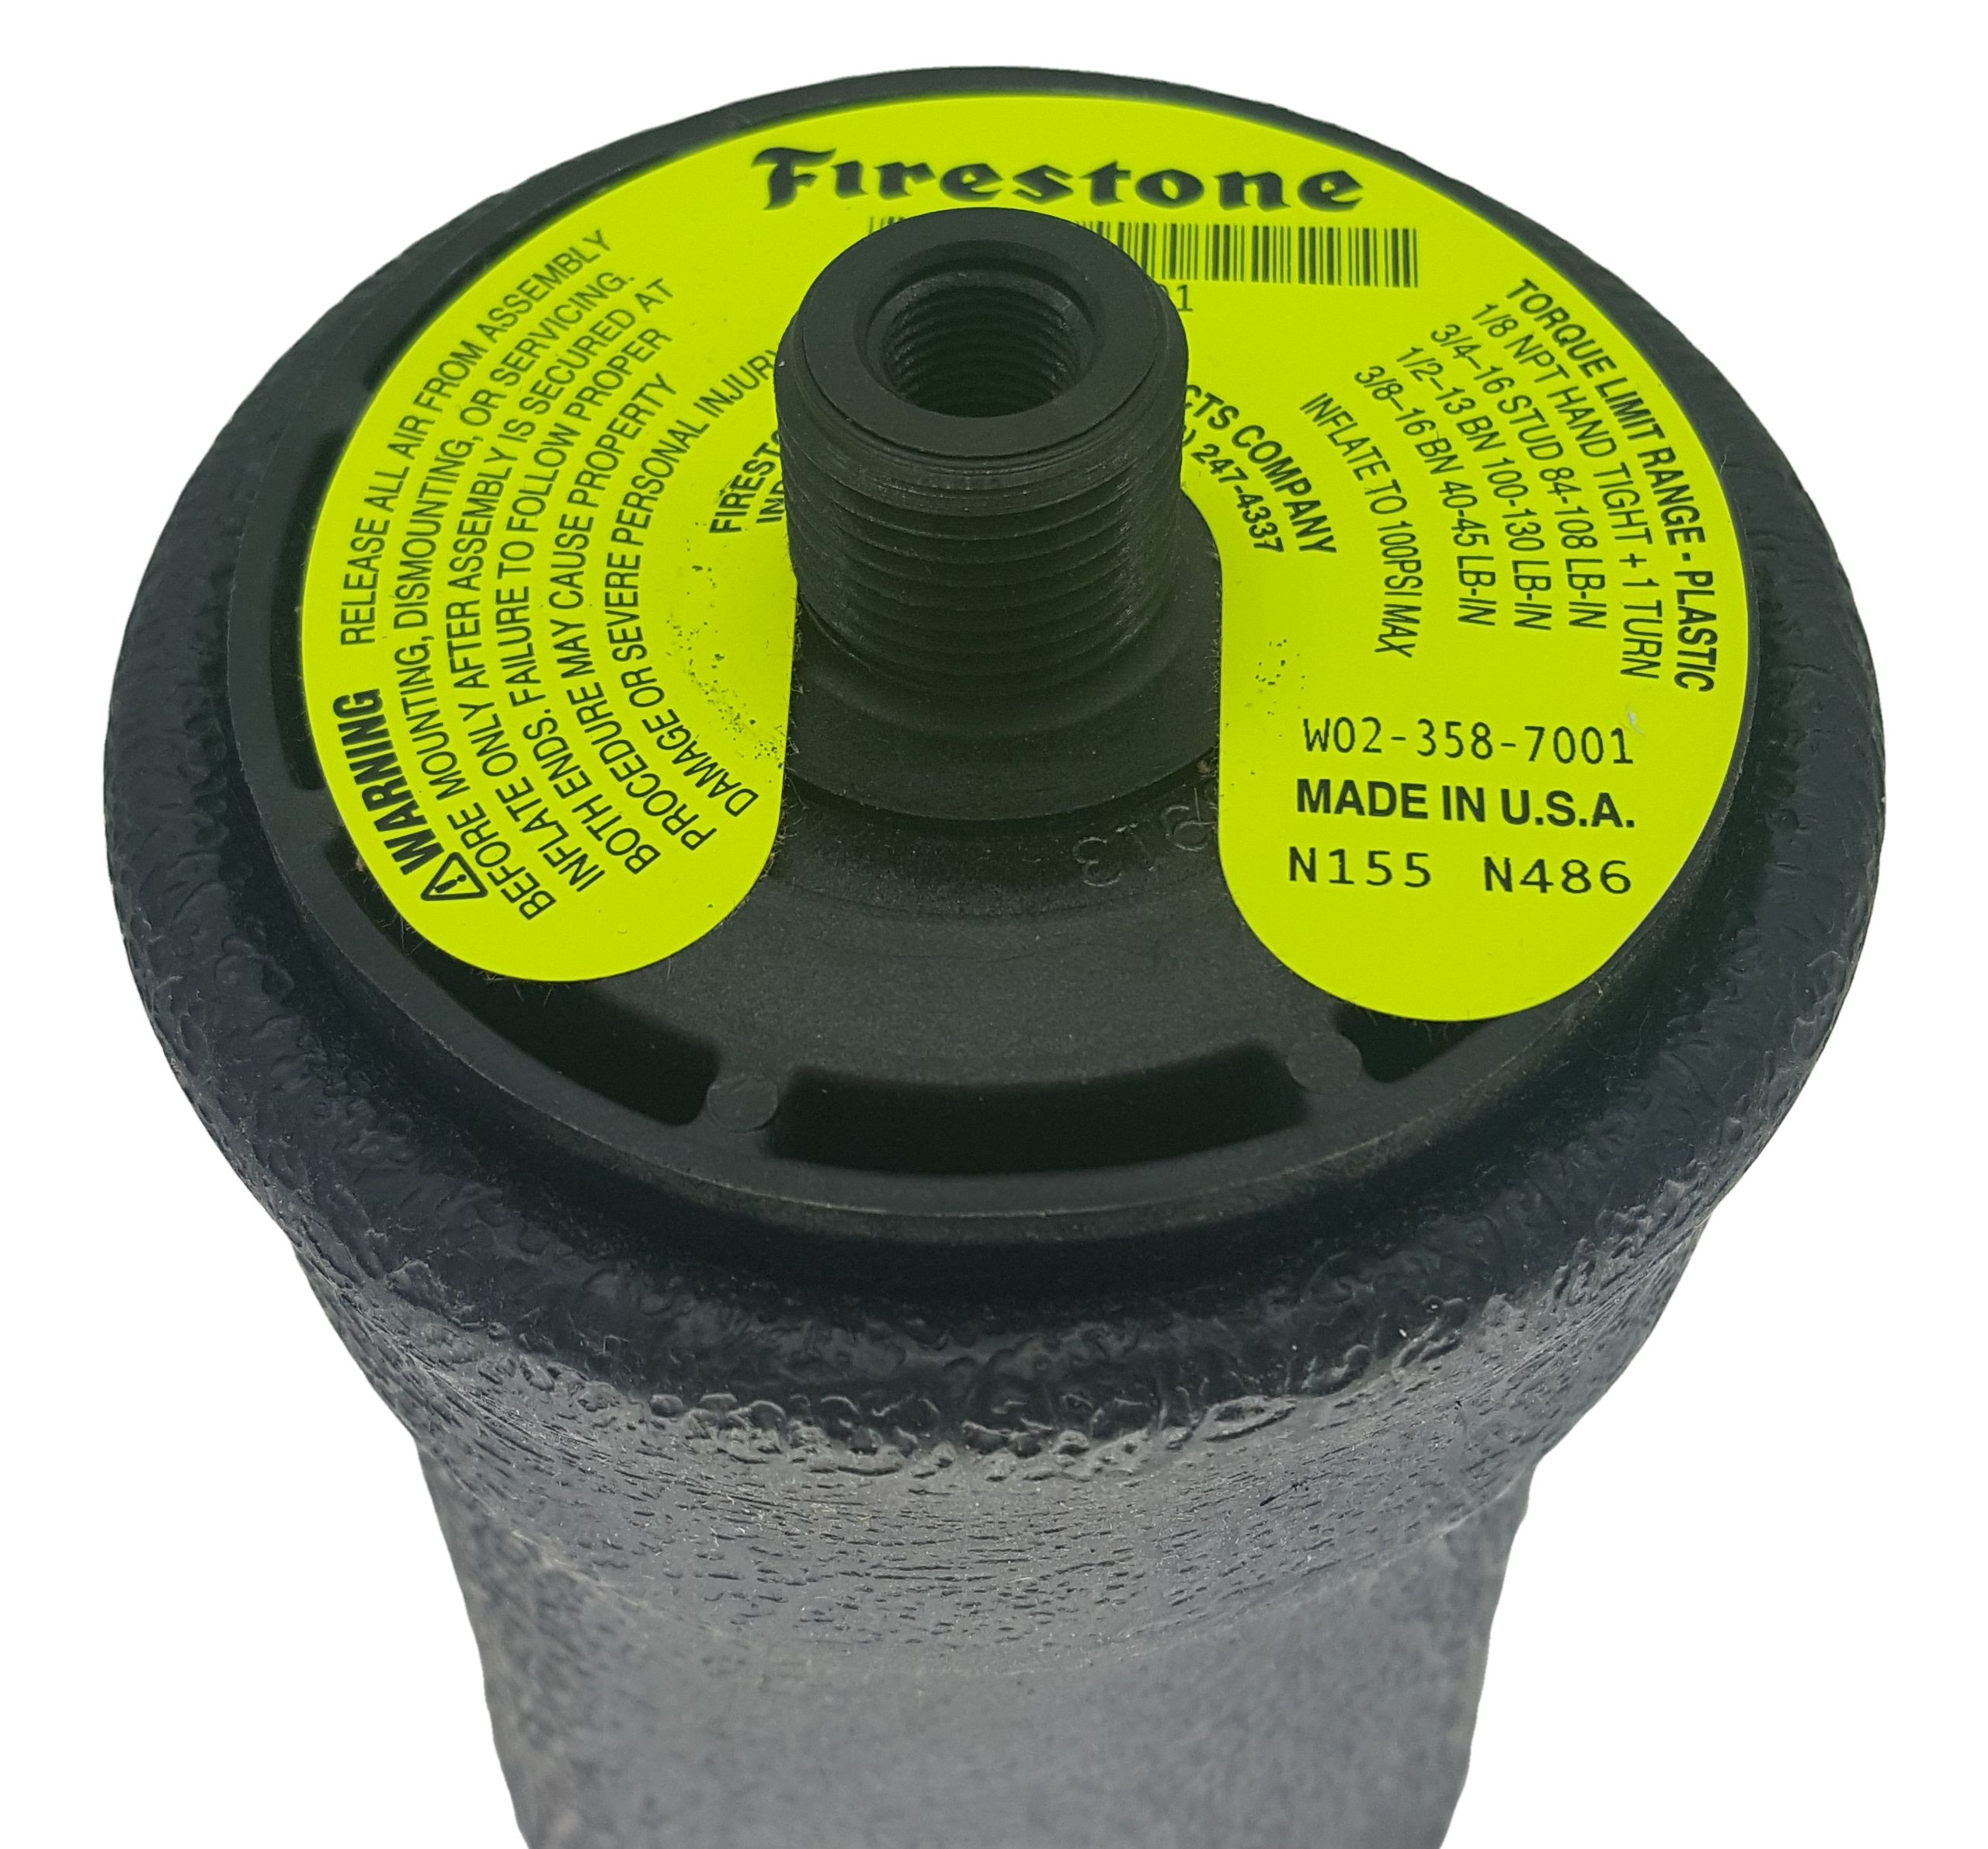 Firestone W02-358-7001 Air Spring Orange Logo   Kenworth T81-1001 Link  1102-0020 1102-0023